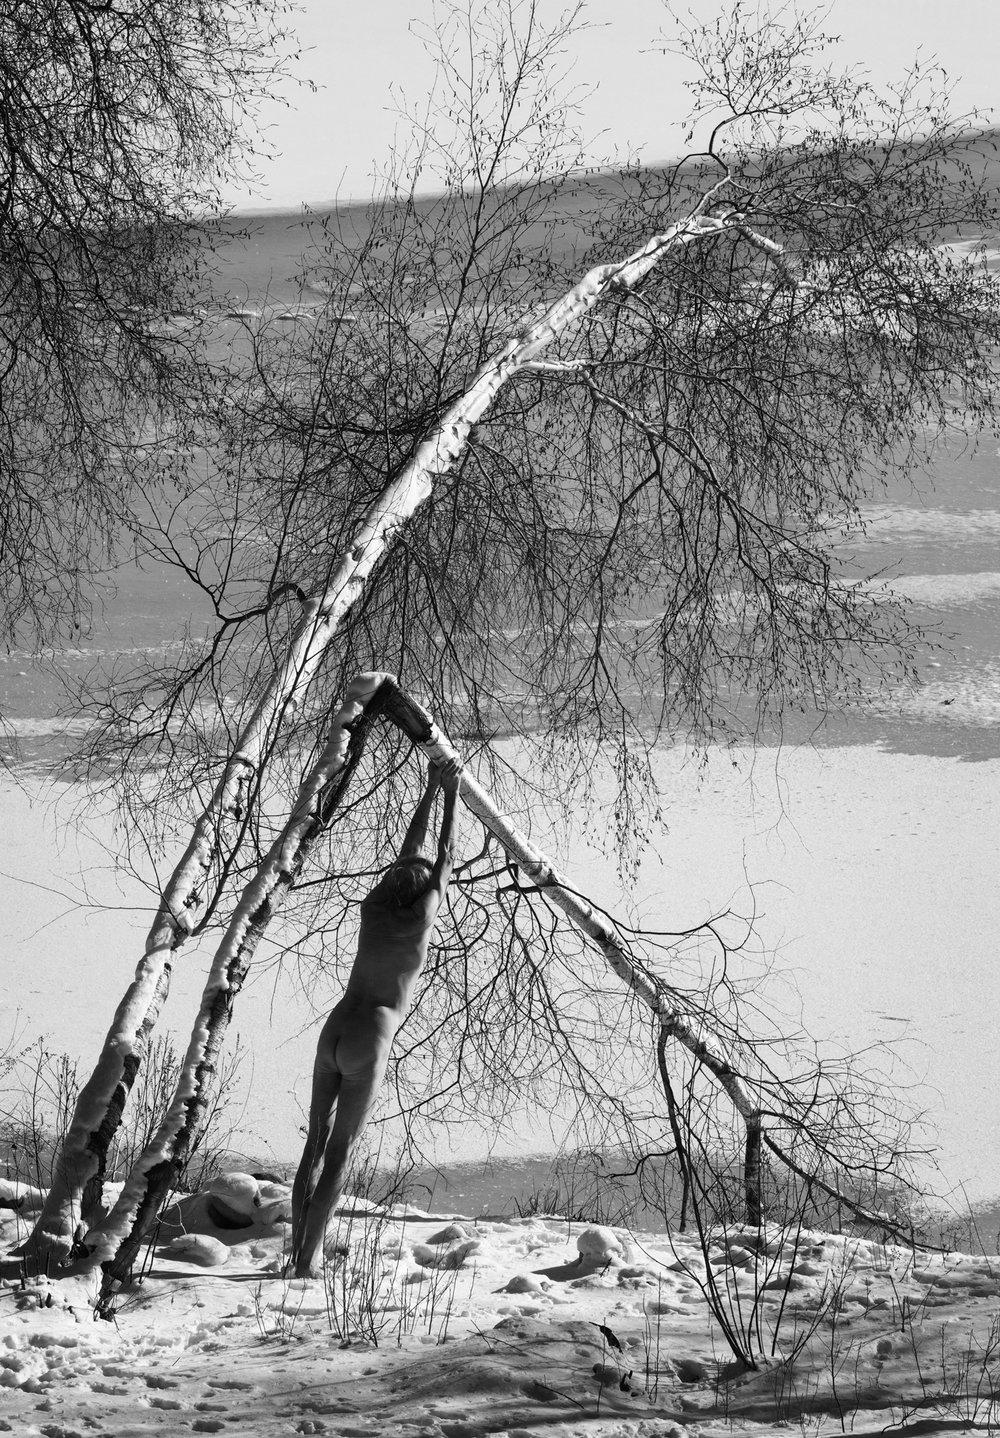 Arno Rafael Minkkinen - Broken Birch - 2017